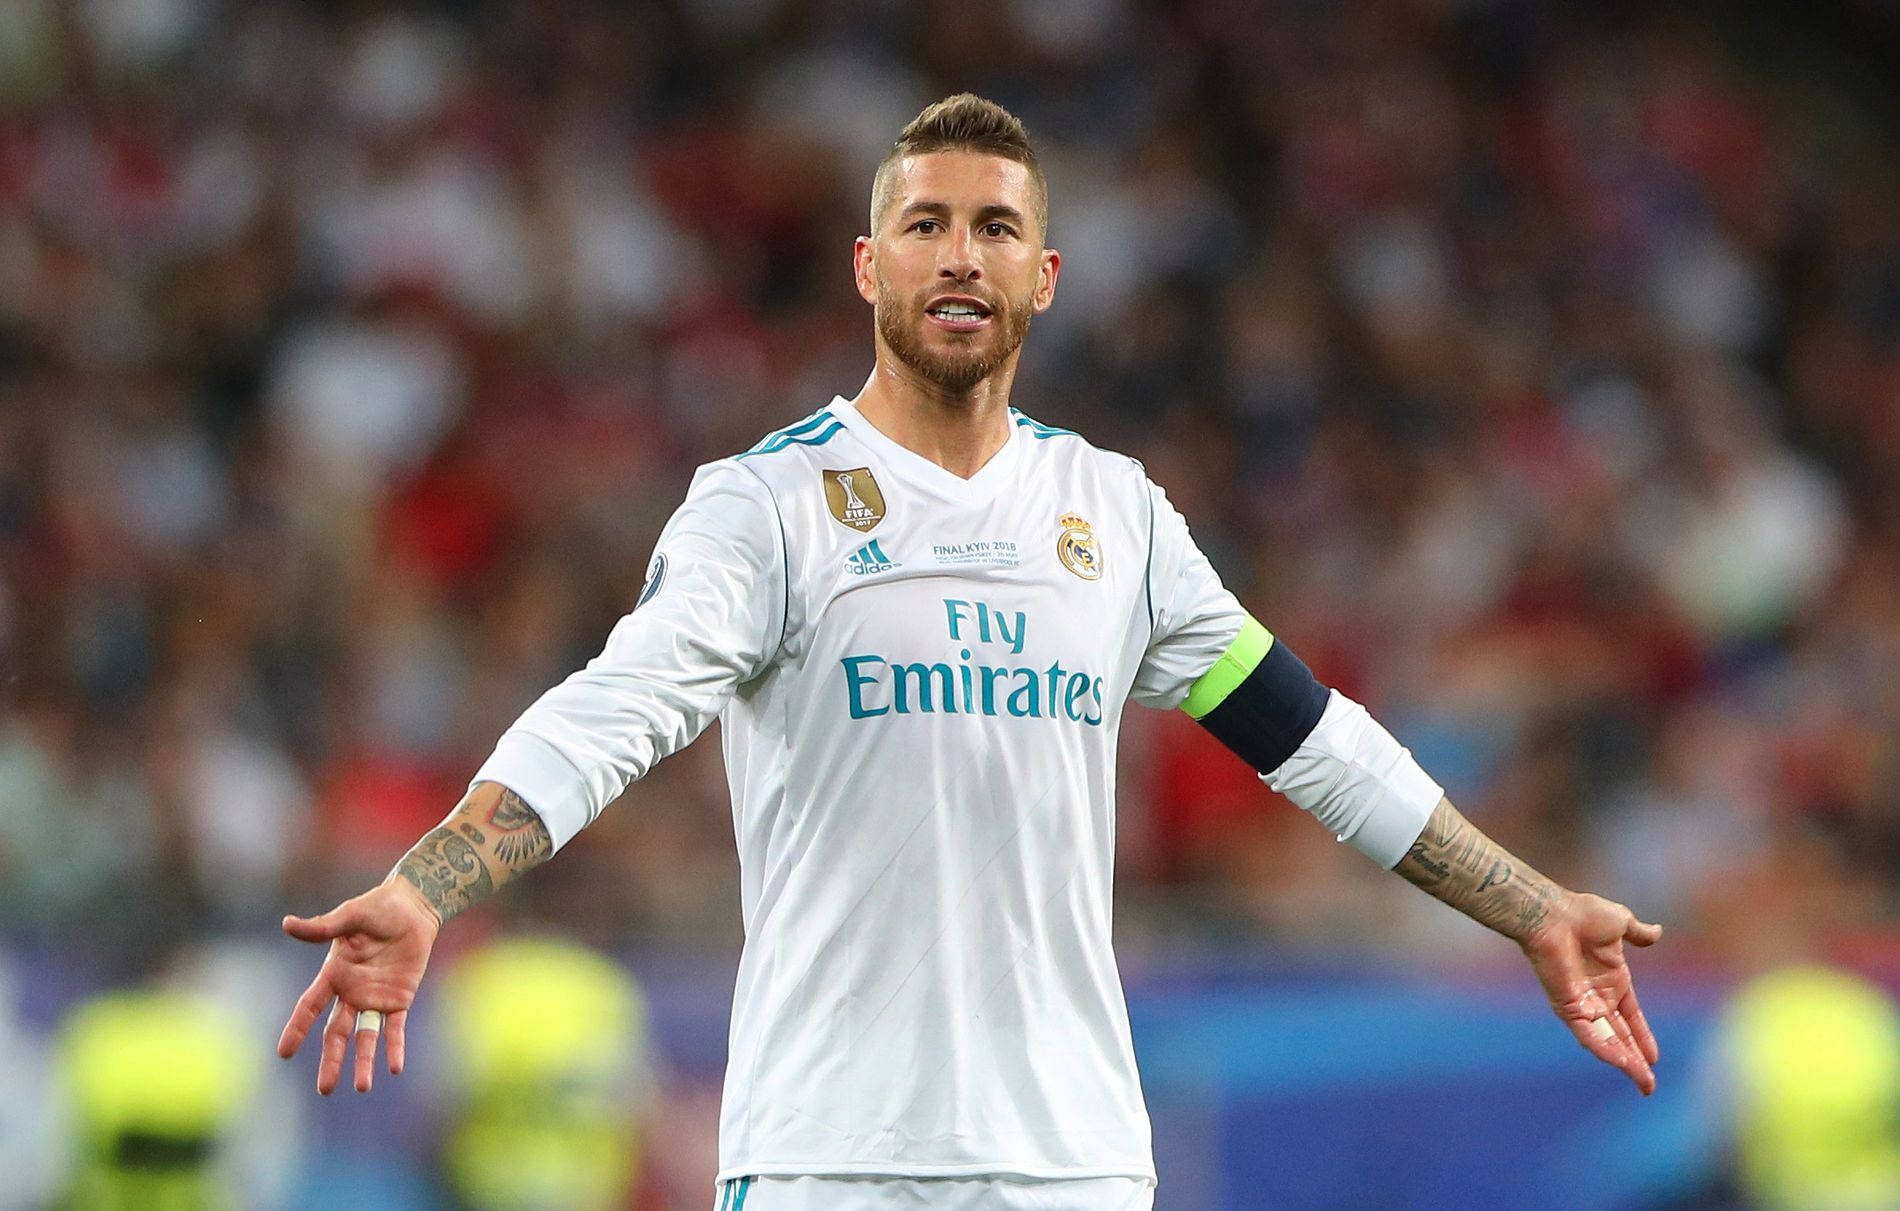 I HARDT VÆR: Sergio Ramos, her fra Champions League-finalen mot Liverpool, er i hardt vær om dagen.